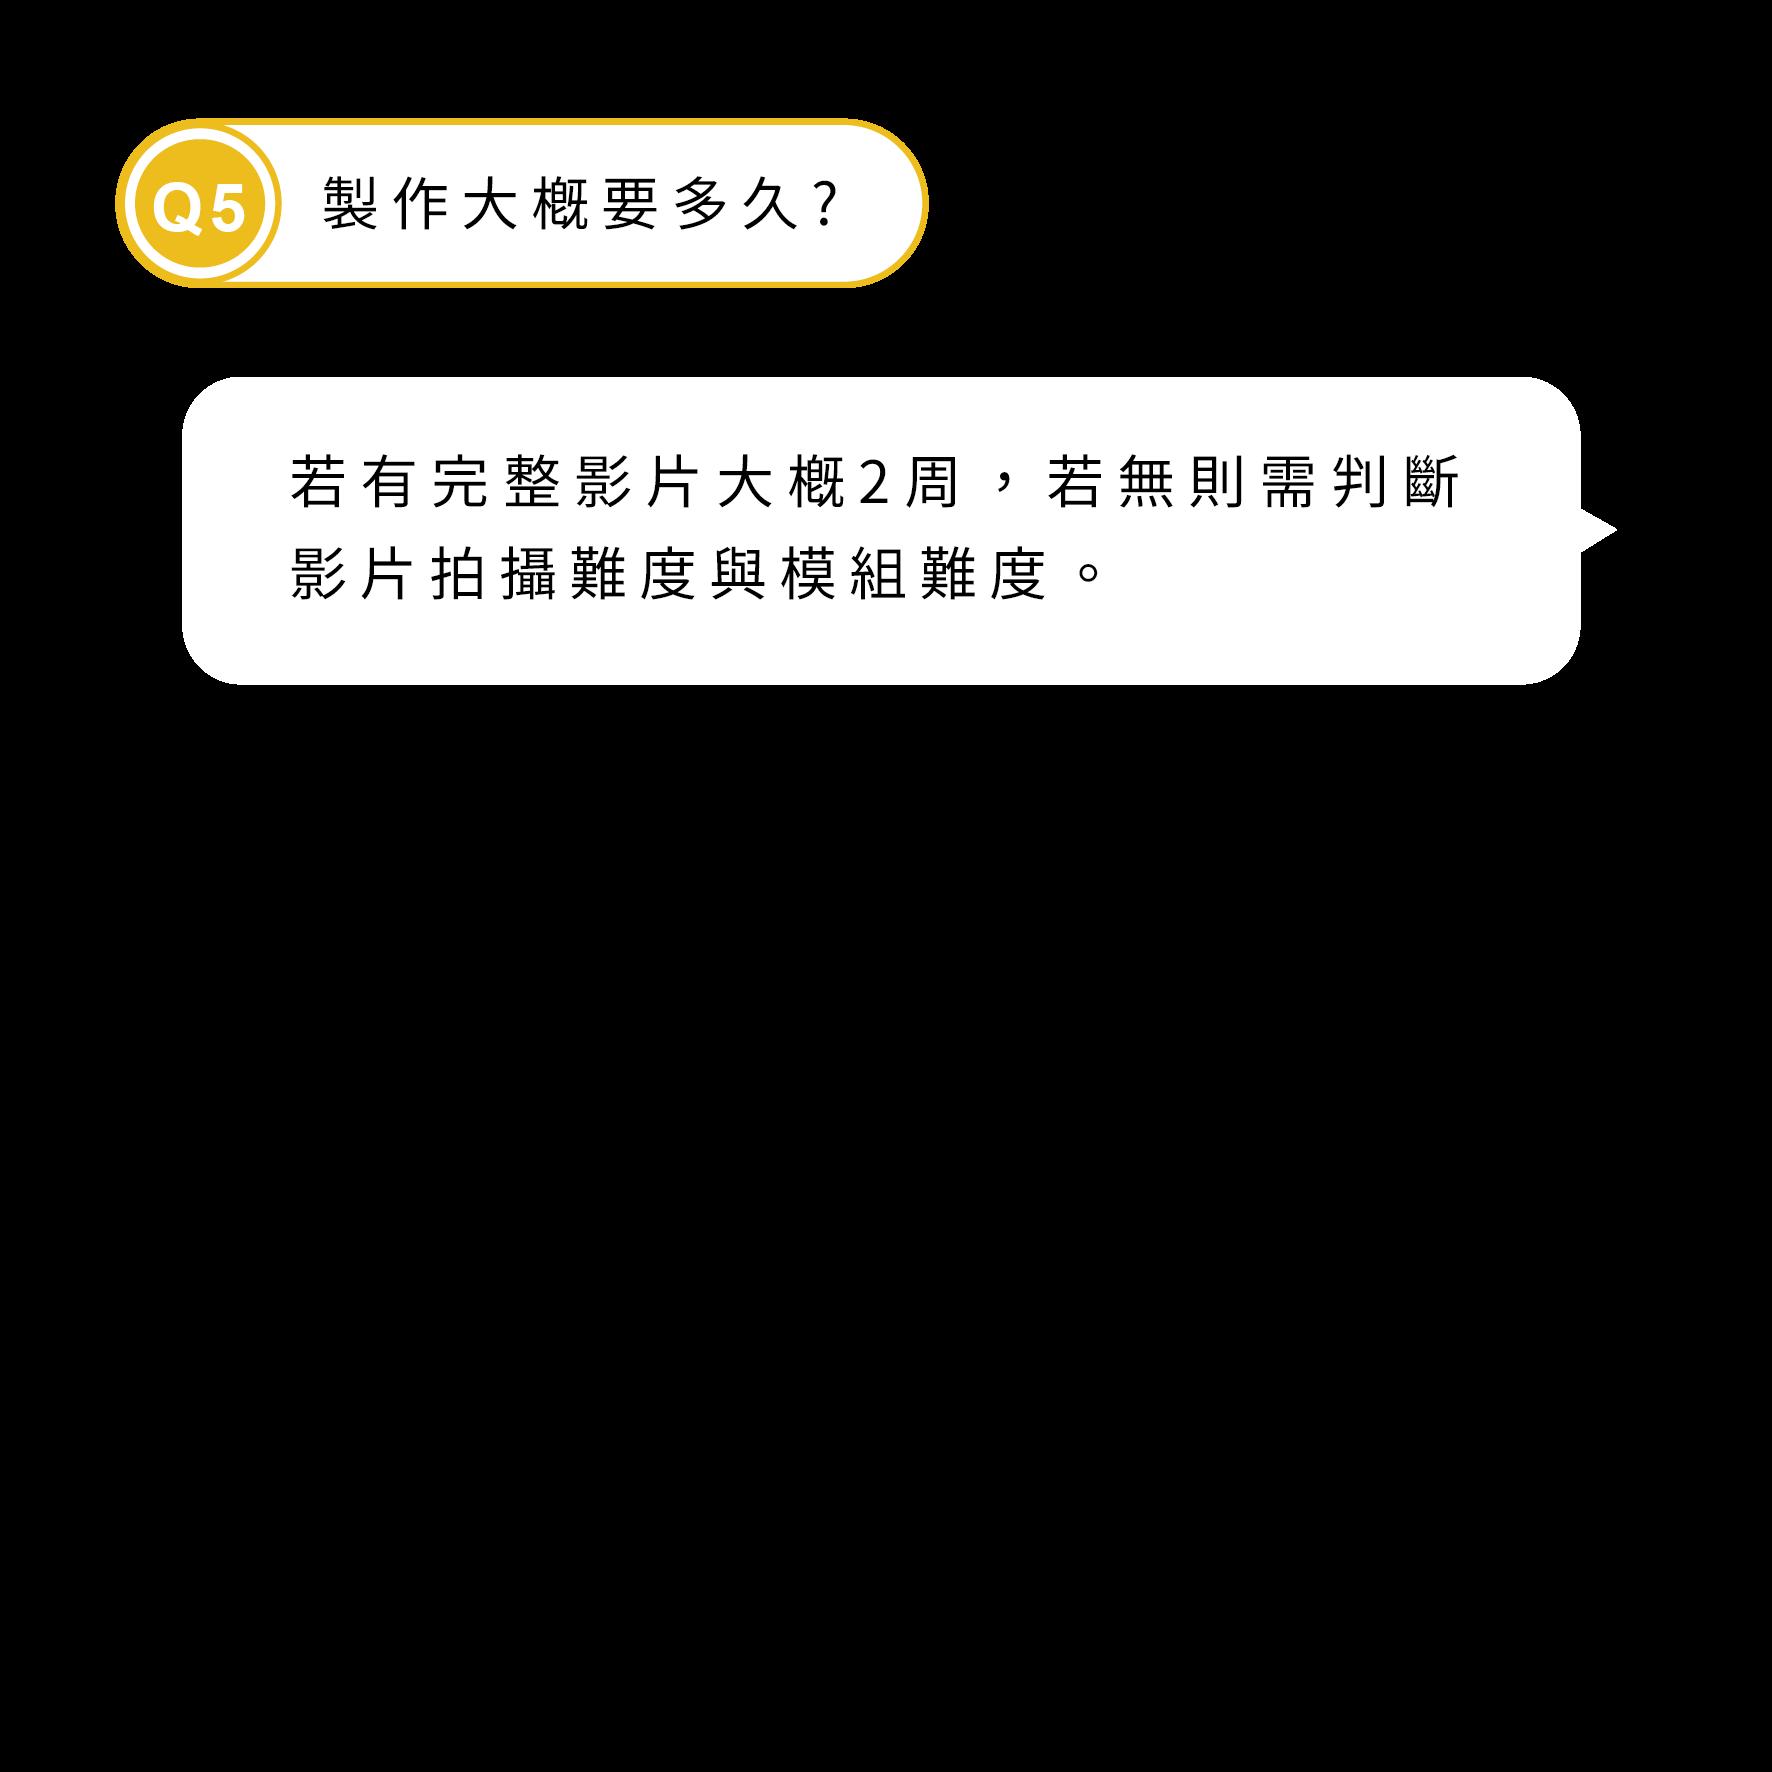 Q5 (2)